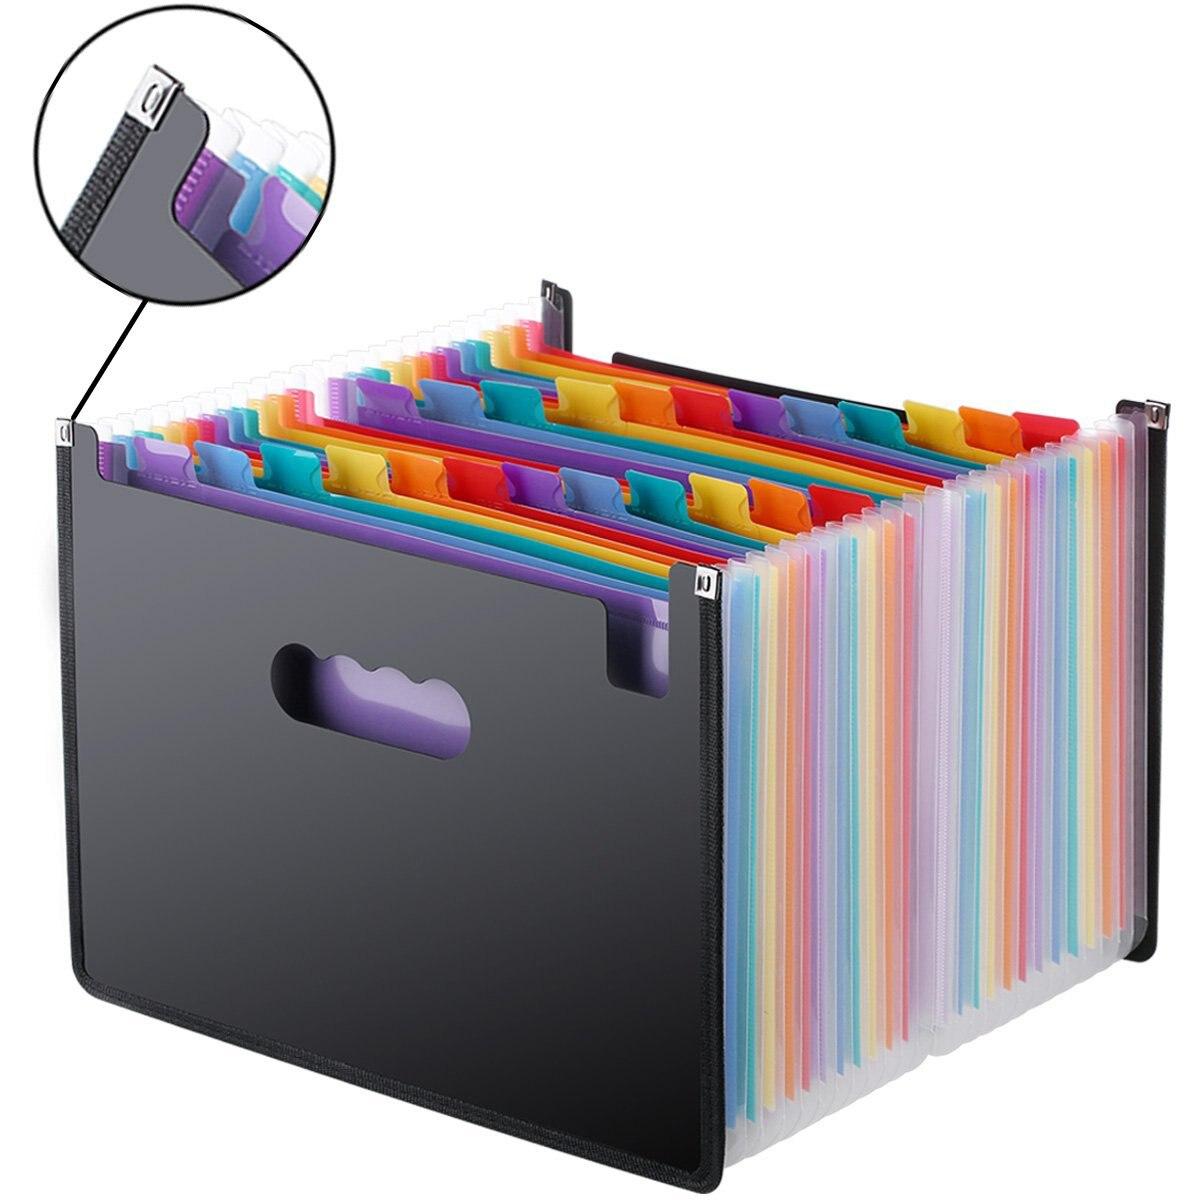 13/24/37/48 Pockets Expanding File Folder A4 Organizer Portable Business File Office Supplies Document Holder Carpeta Archivador 3